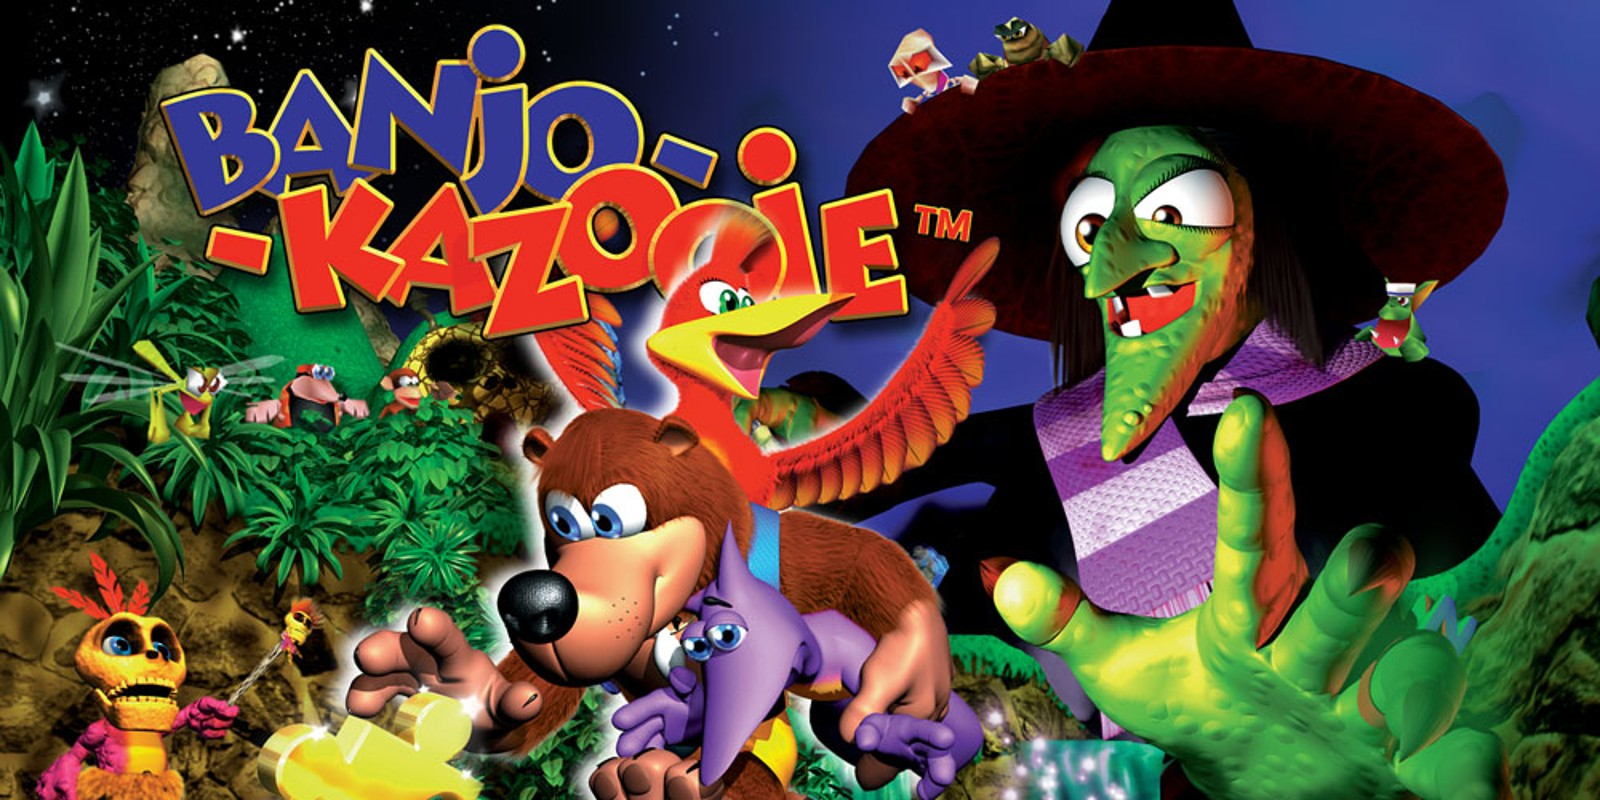 Banjo-Kazooie Video game